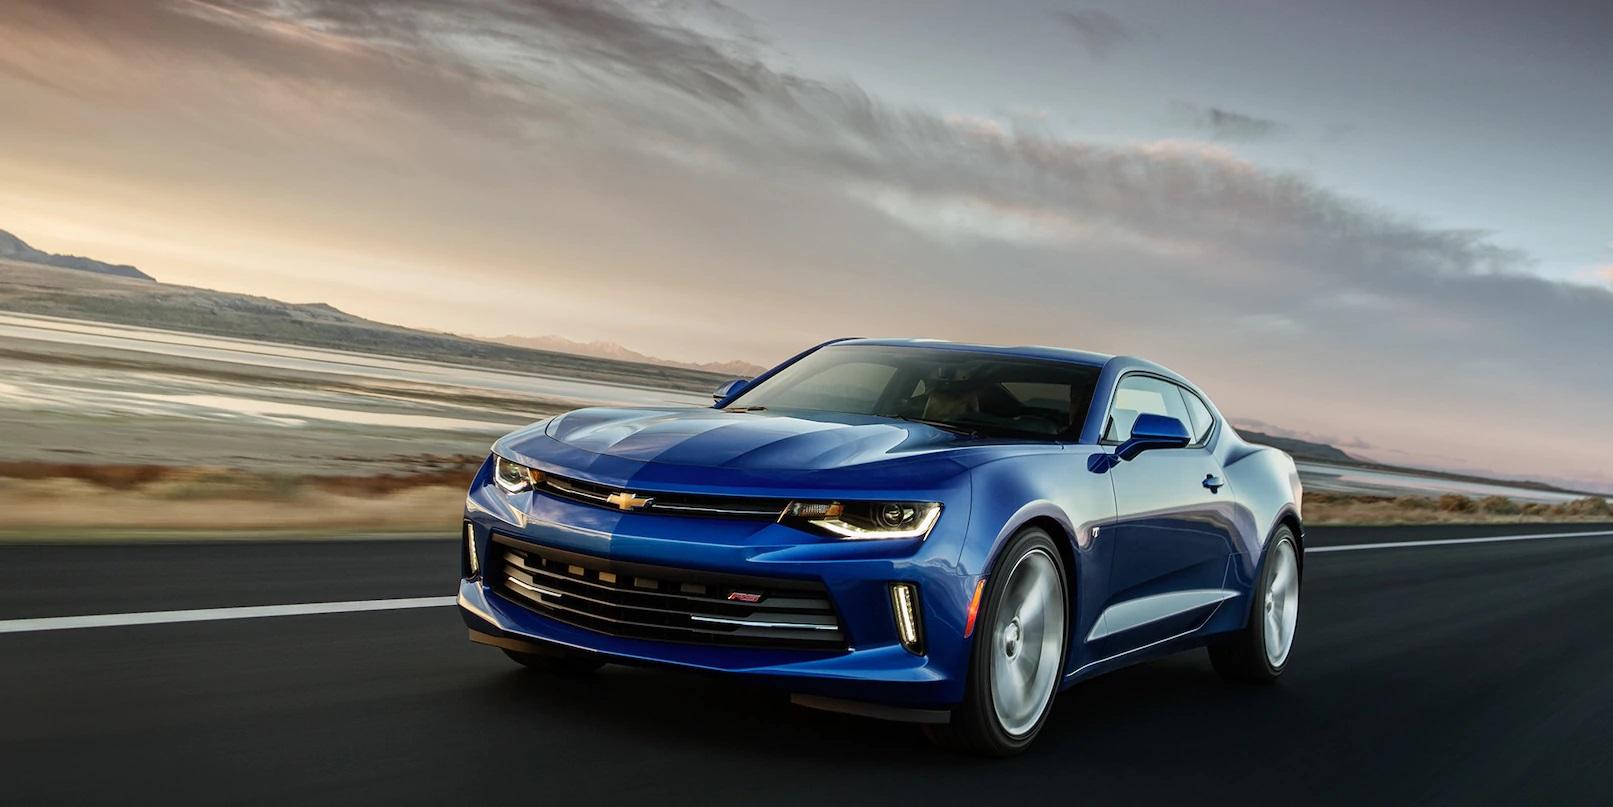 Chevrolet Camaro Leasing In Oklahoma City OK David Stanley - Oklahoma city chevrolet car dealerships